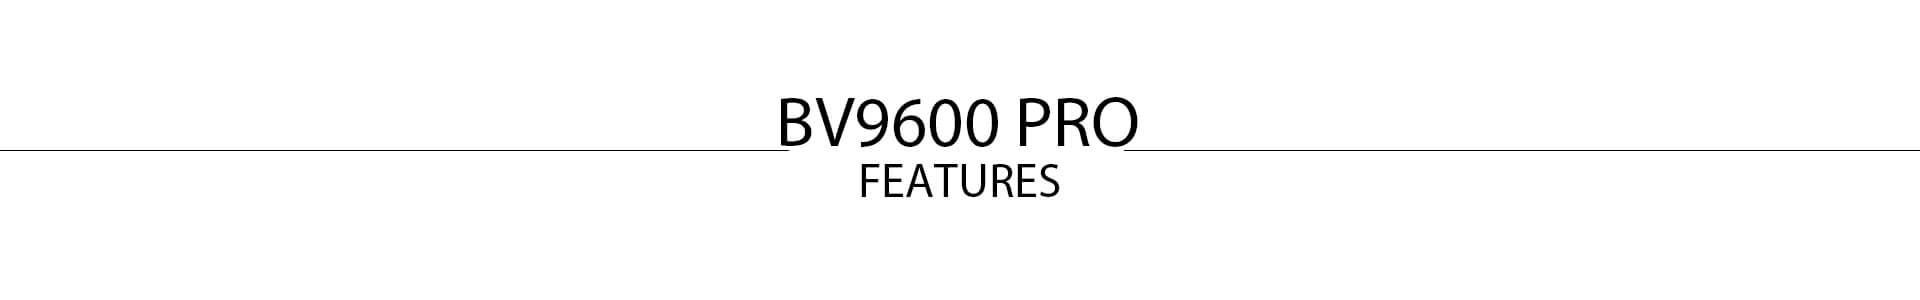 BV9600Pro